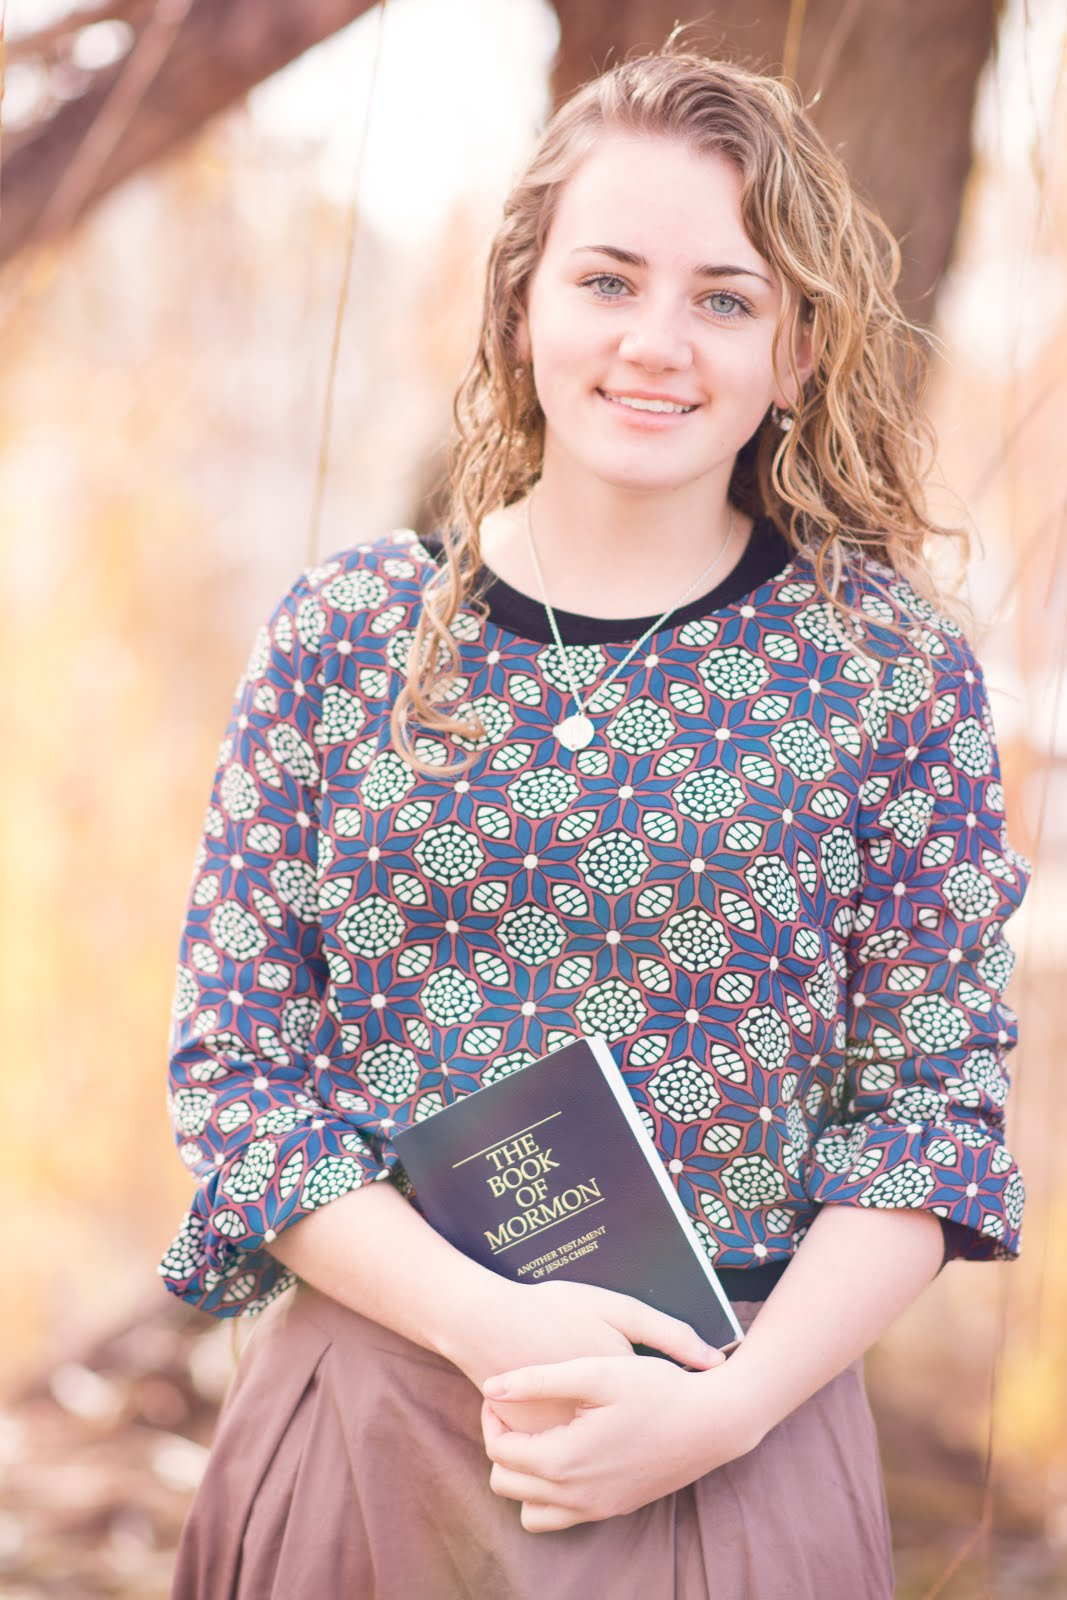 Sister Madison Eva Dille